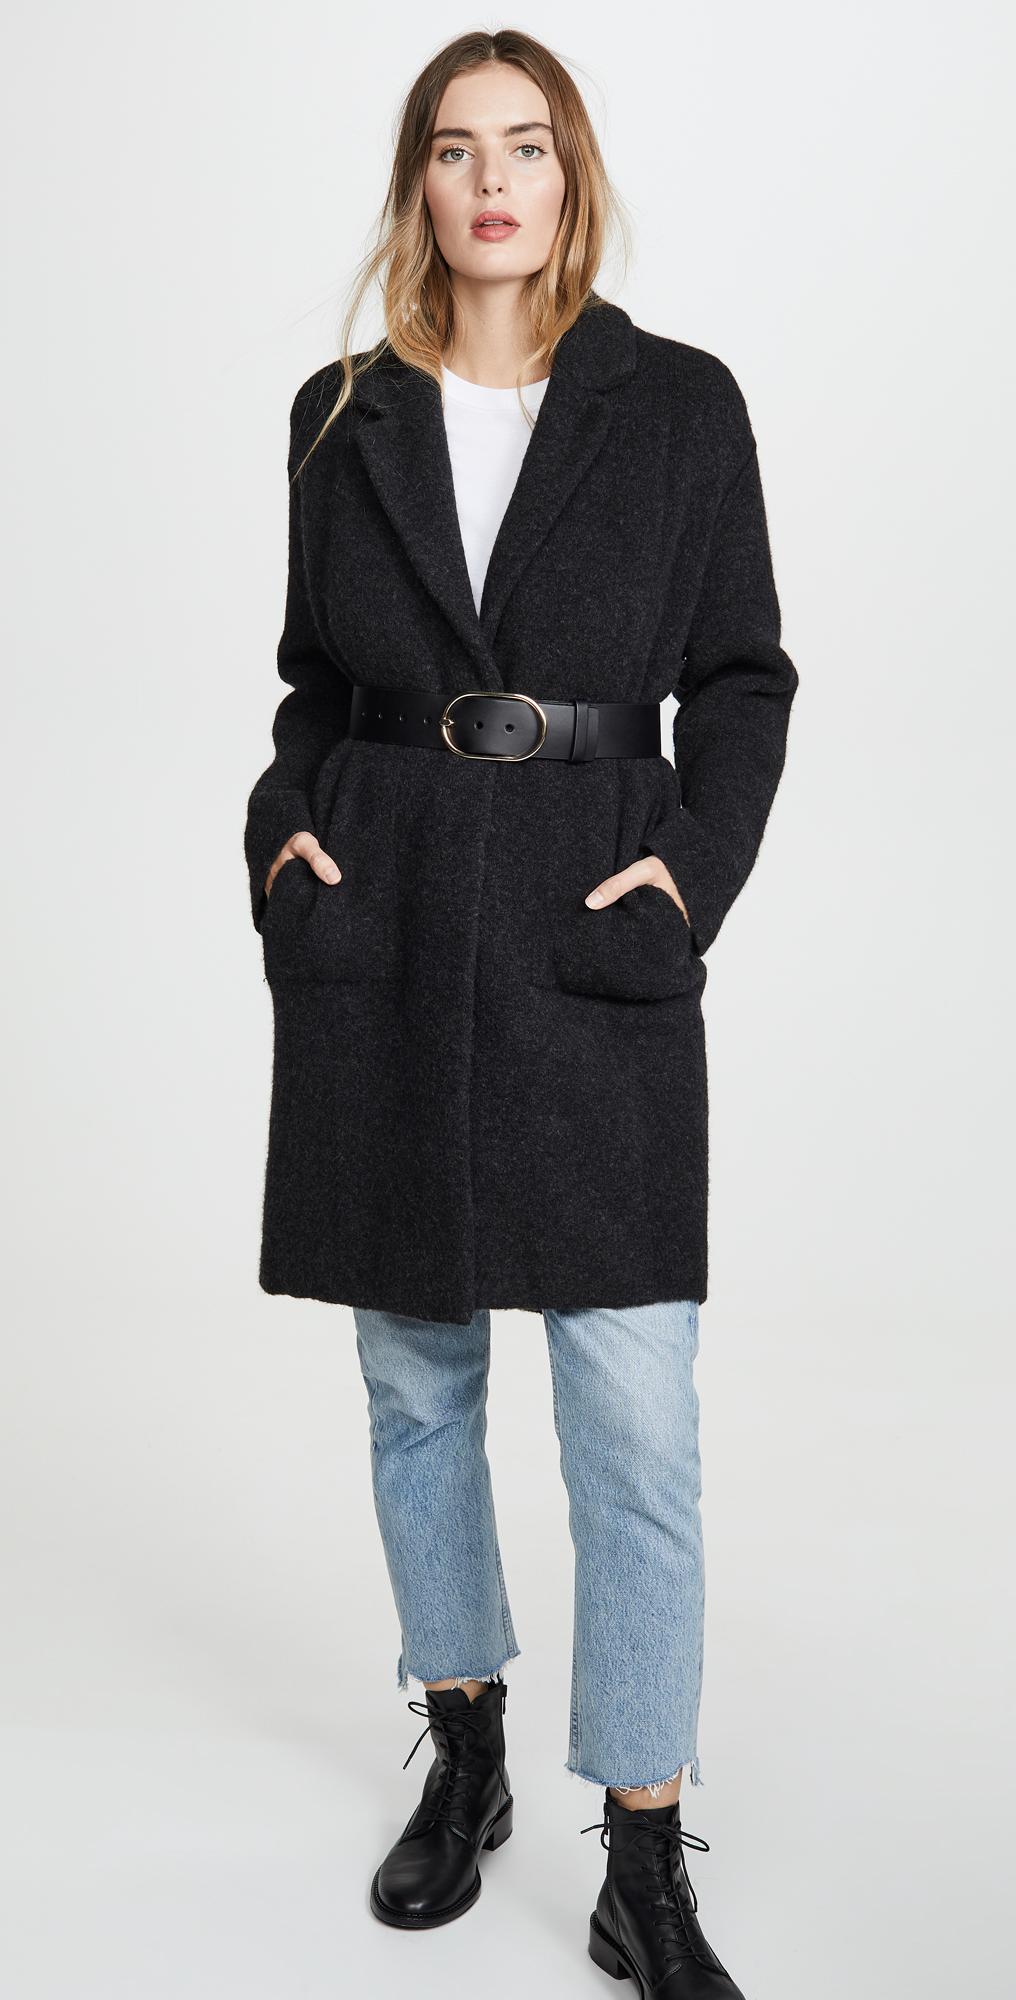 Vince Womens Notch Collar Cardigan